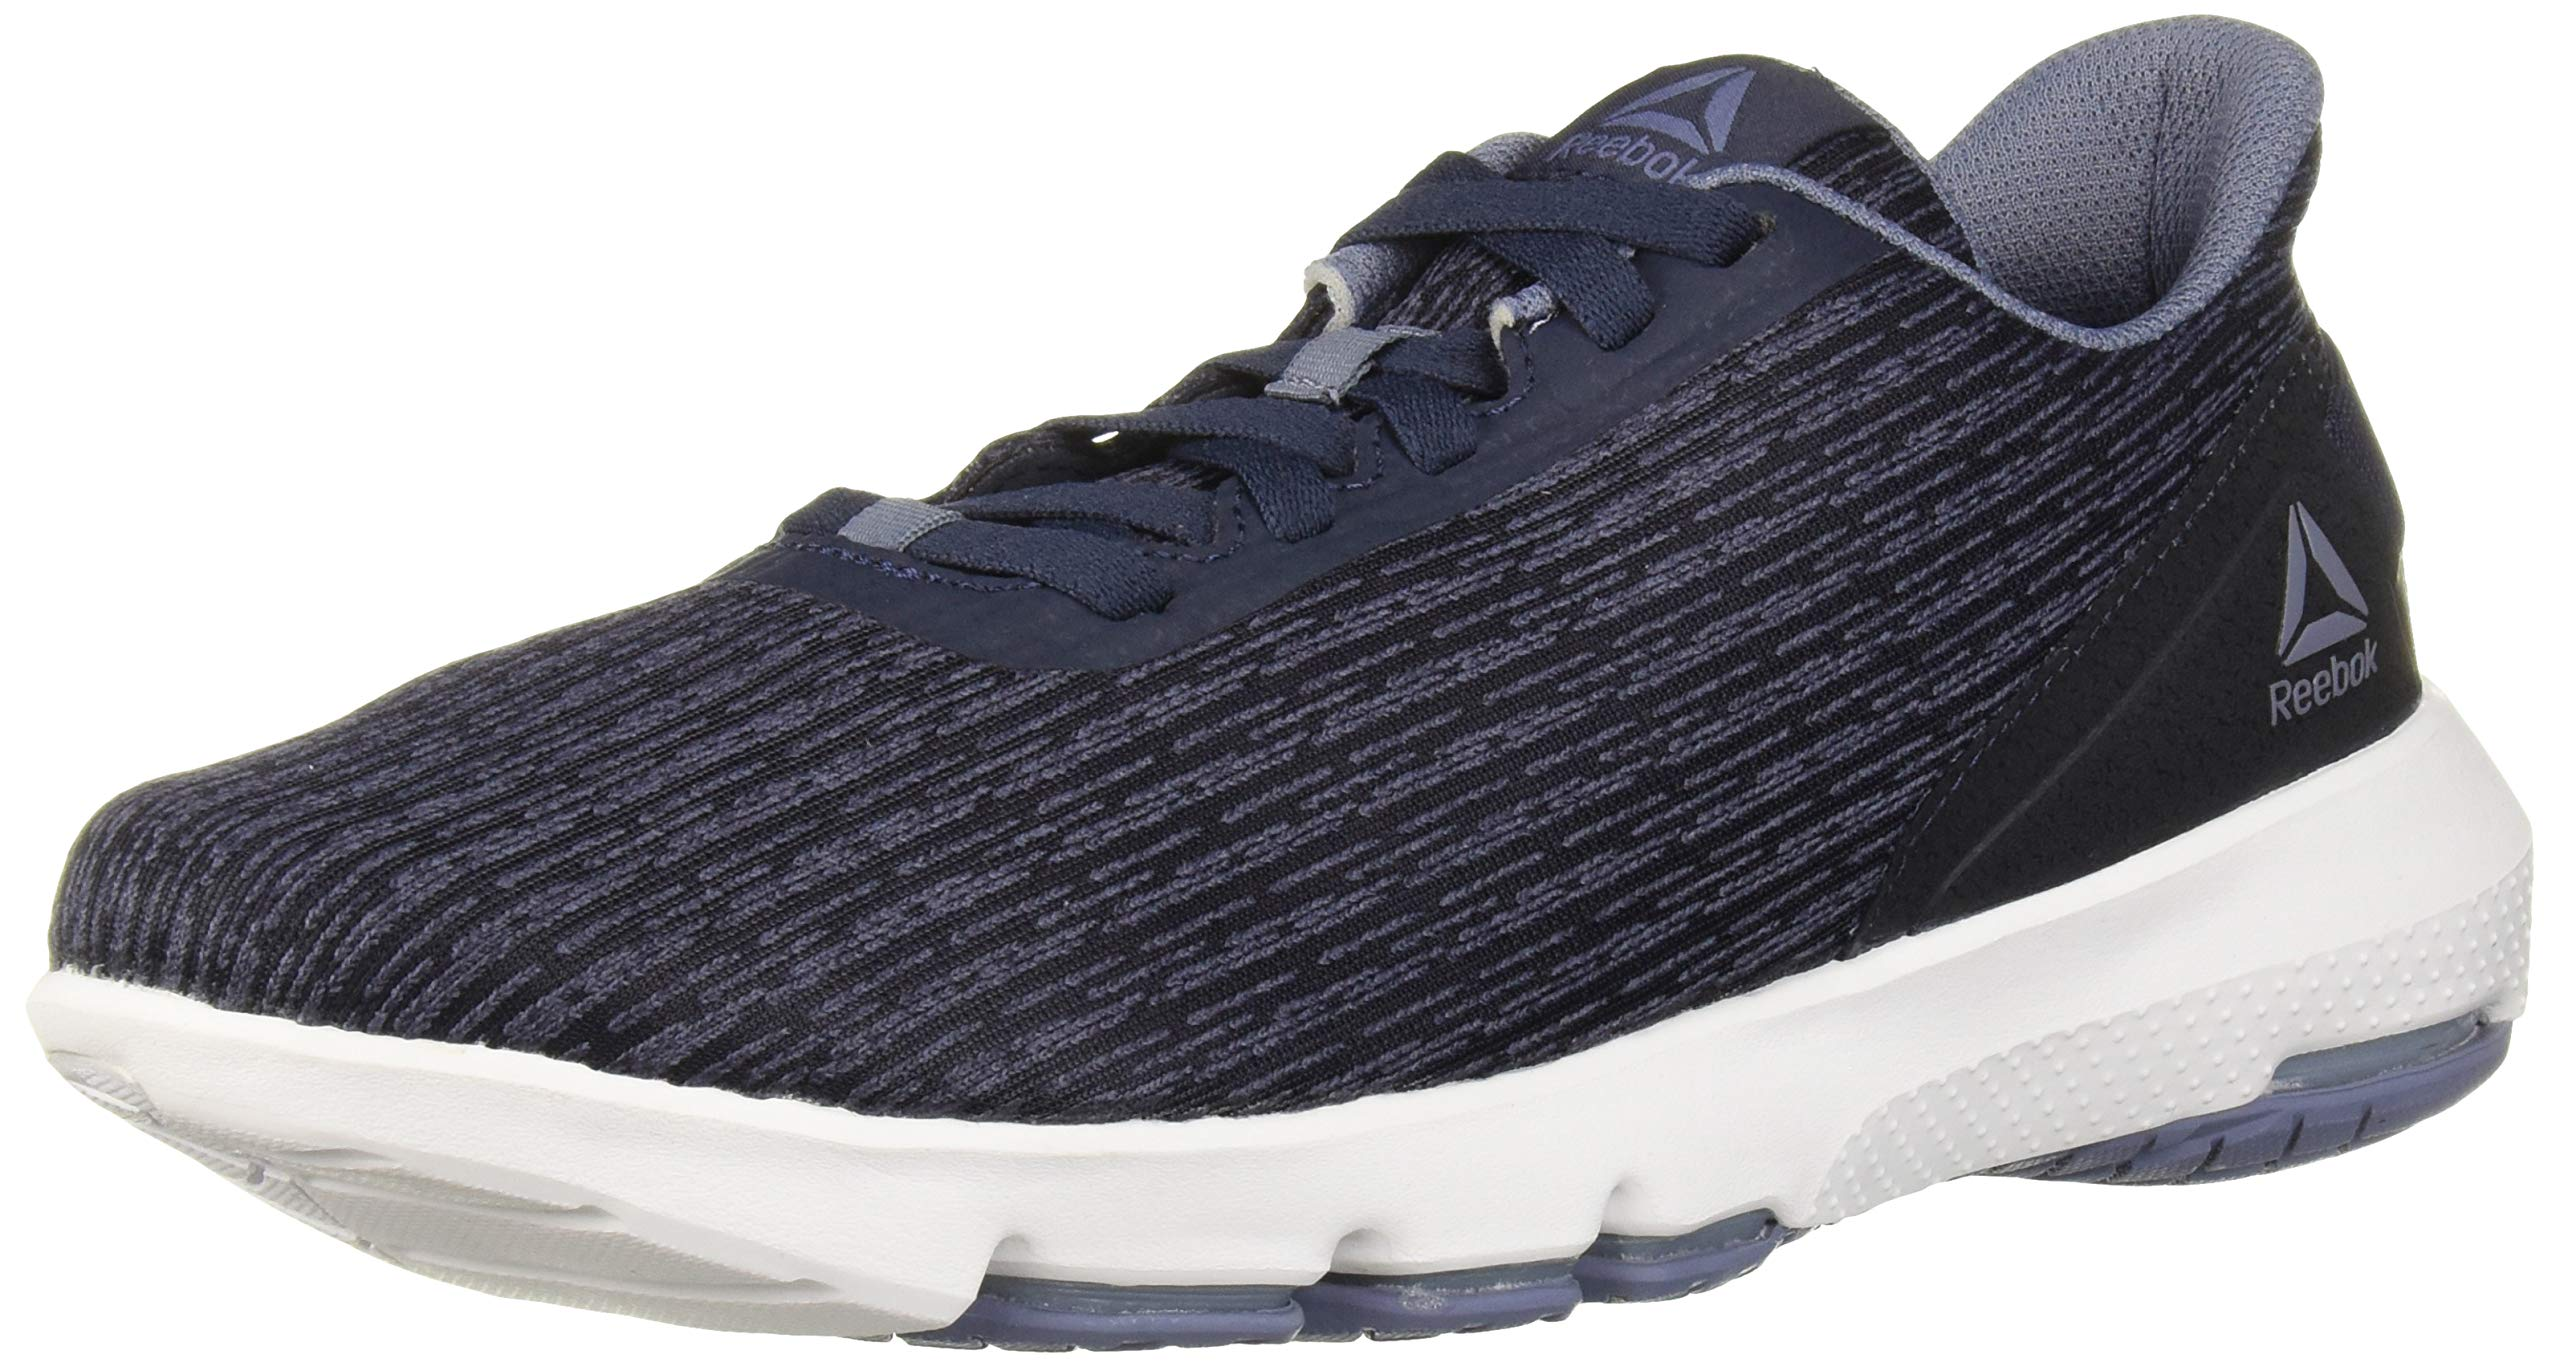 Reebok Men's Cloudride DMX 4.0 Walking Shoe, Navy/Indigo/Royal/White, 10 M US by Reebok